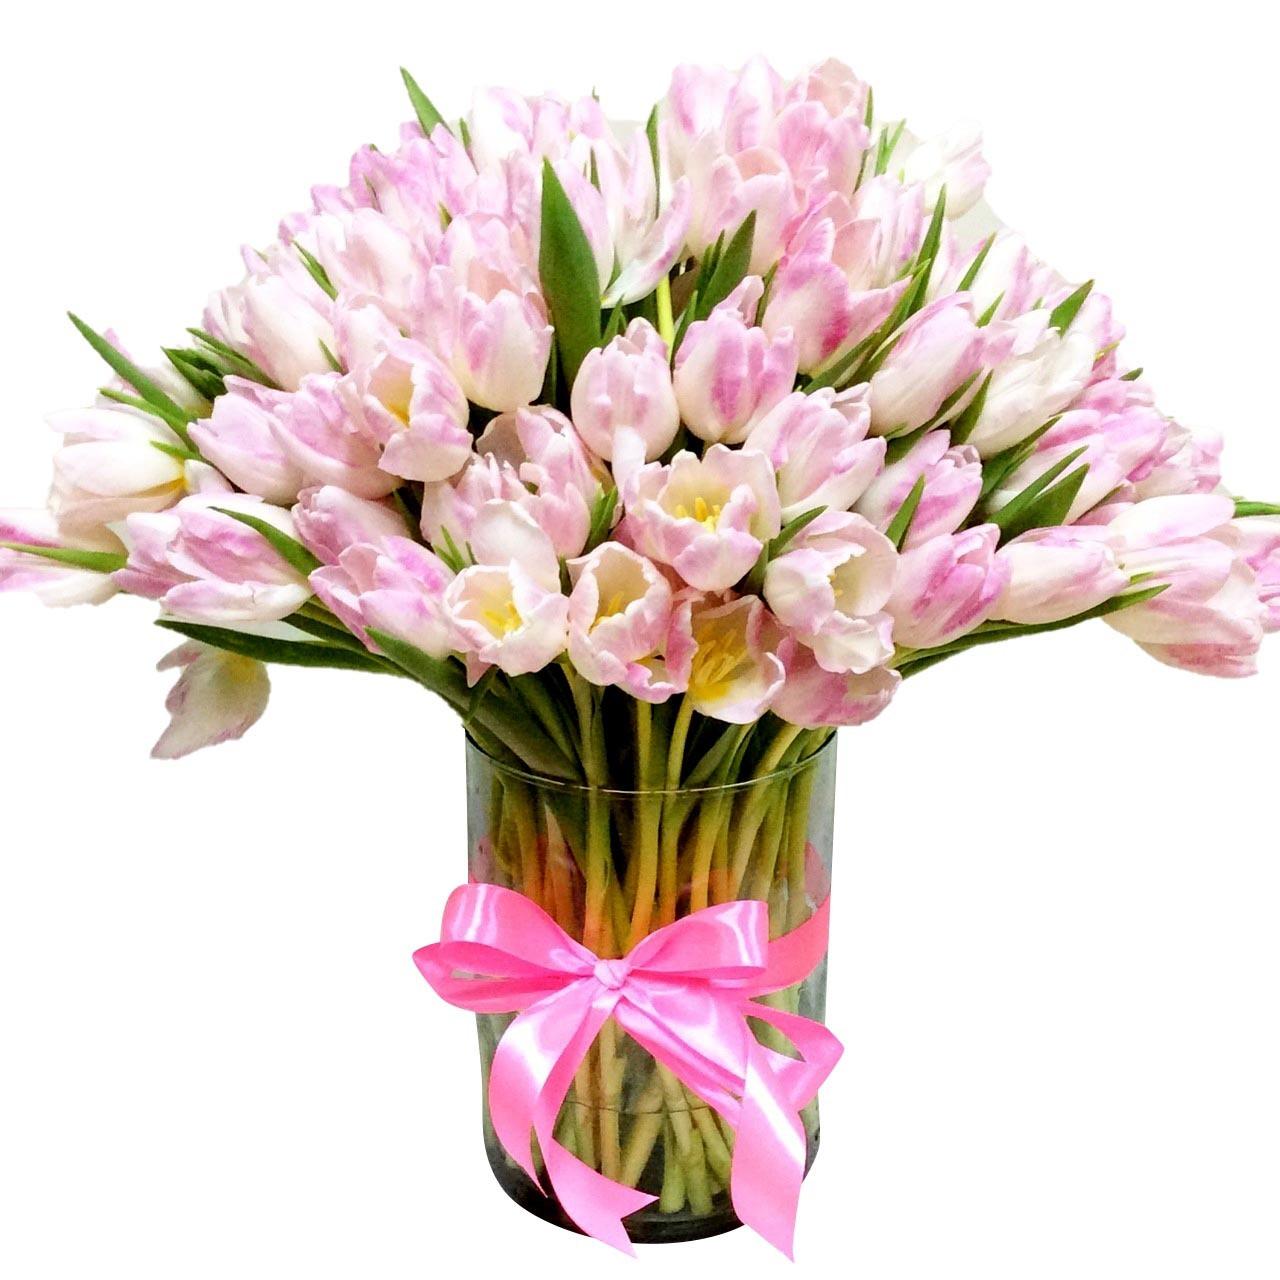 150 Tulips Giant Bouquet